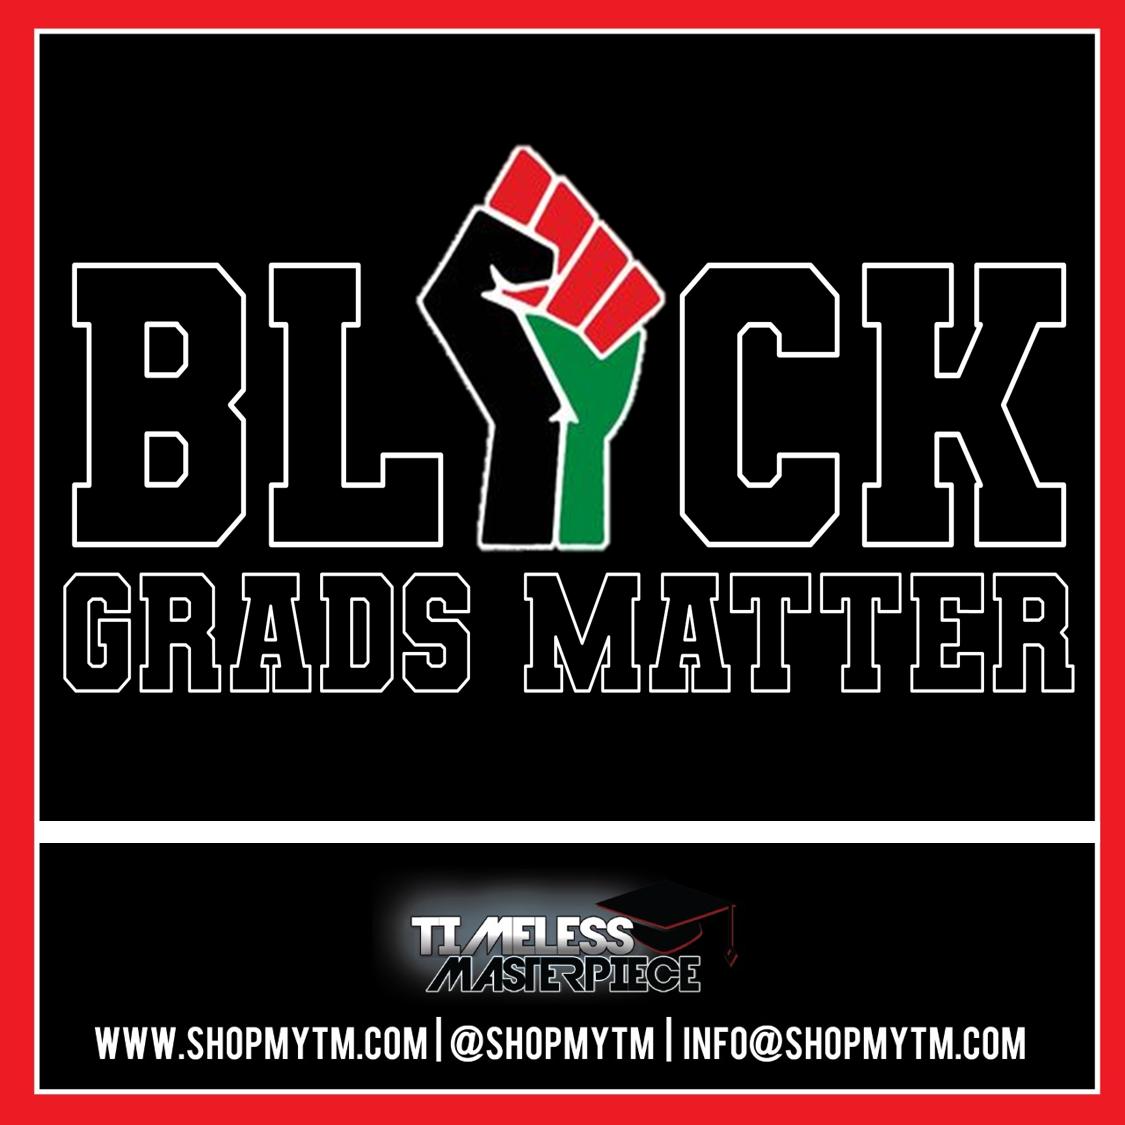 BLACK Grads Matter GRAD Apparel Shirt